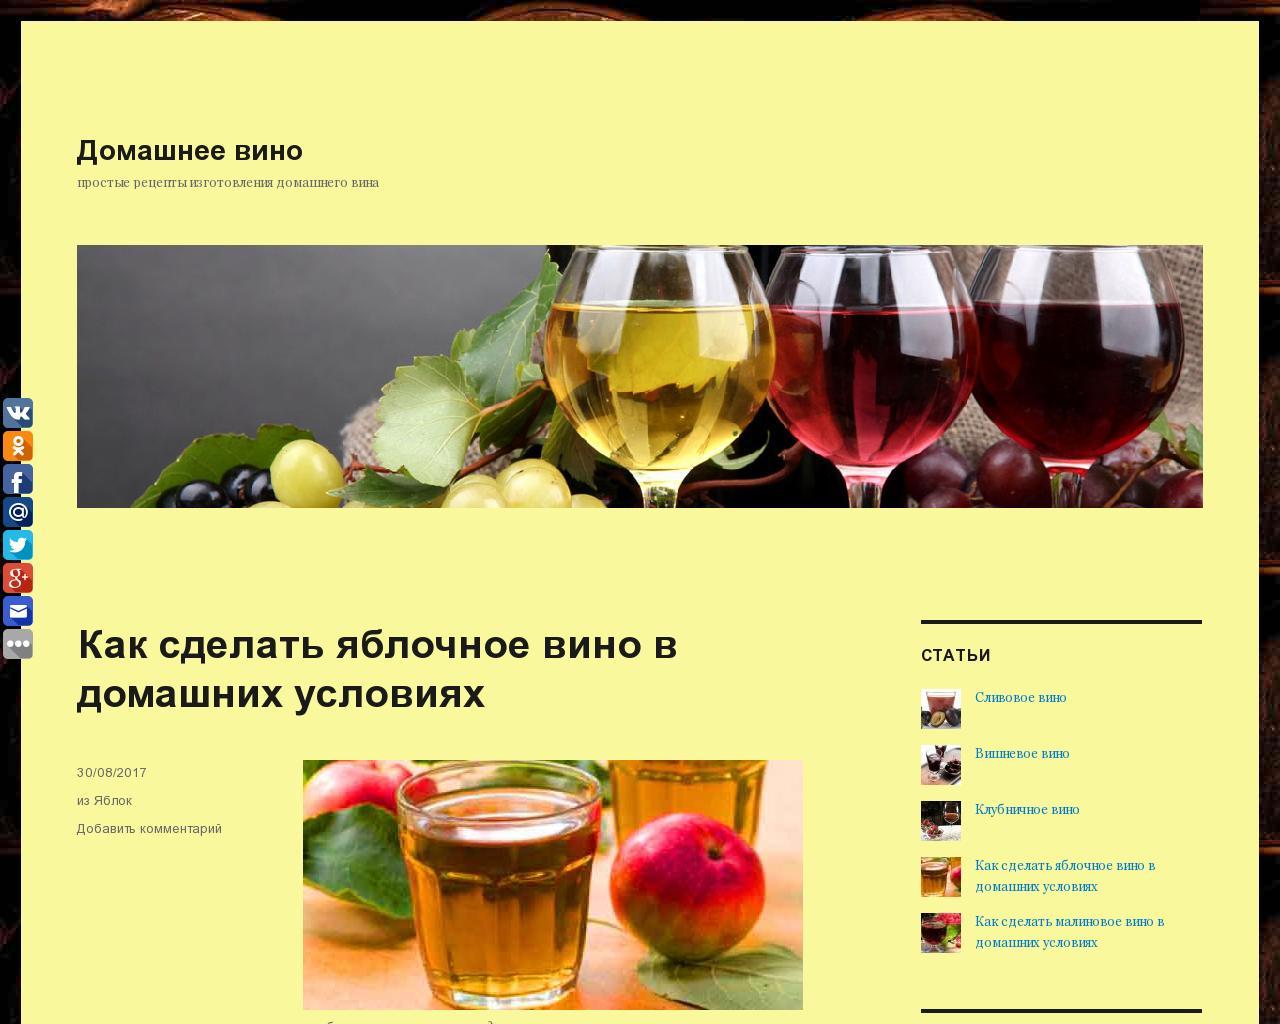 Рецепт вишневого домашнего вина